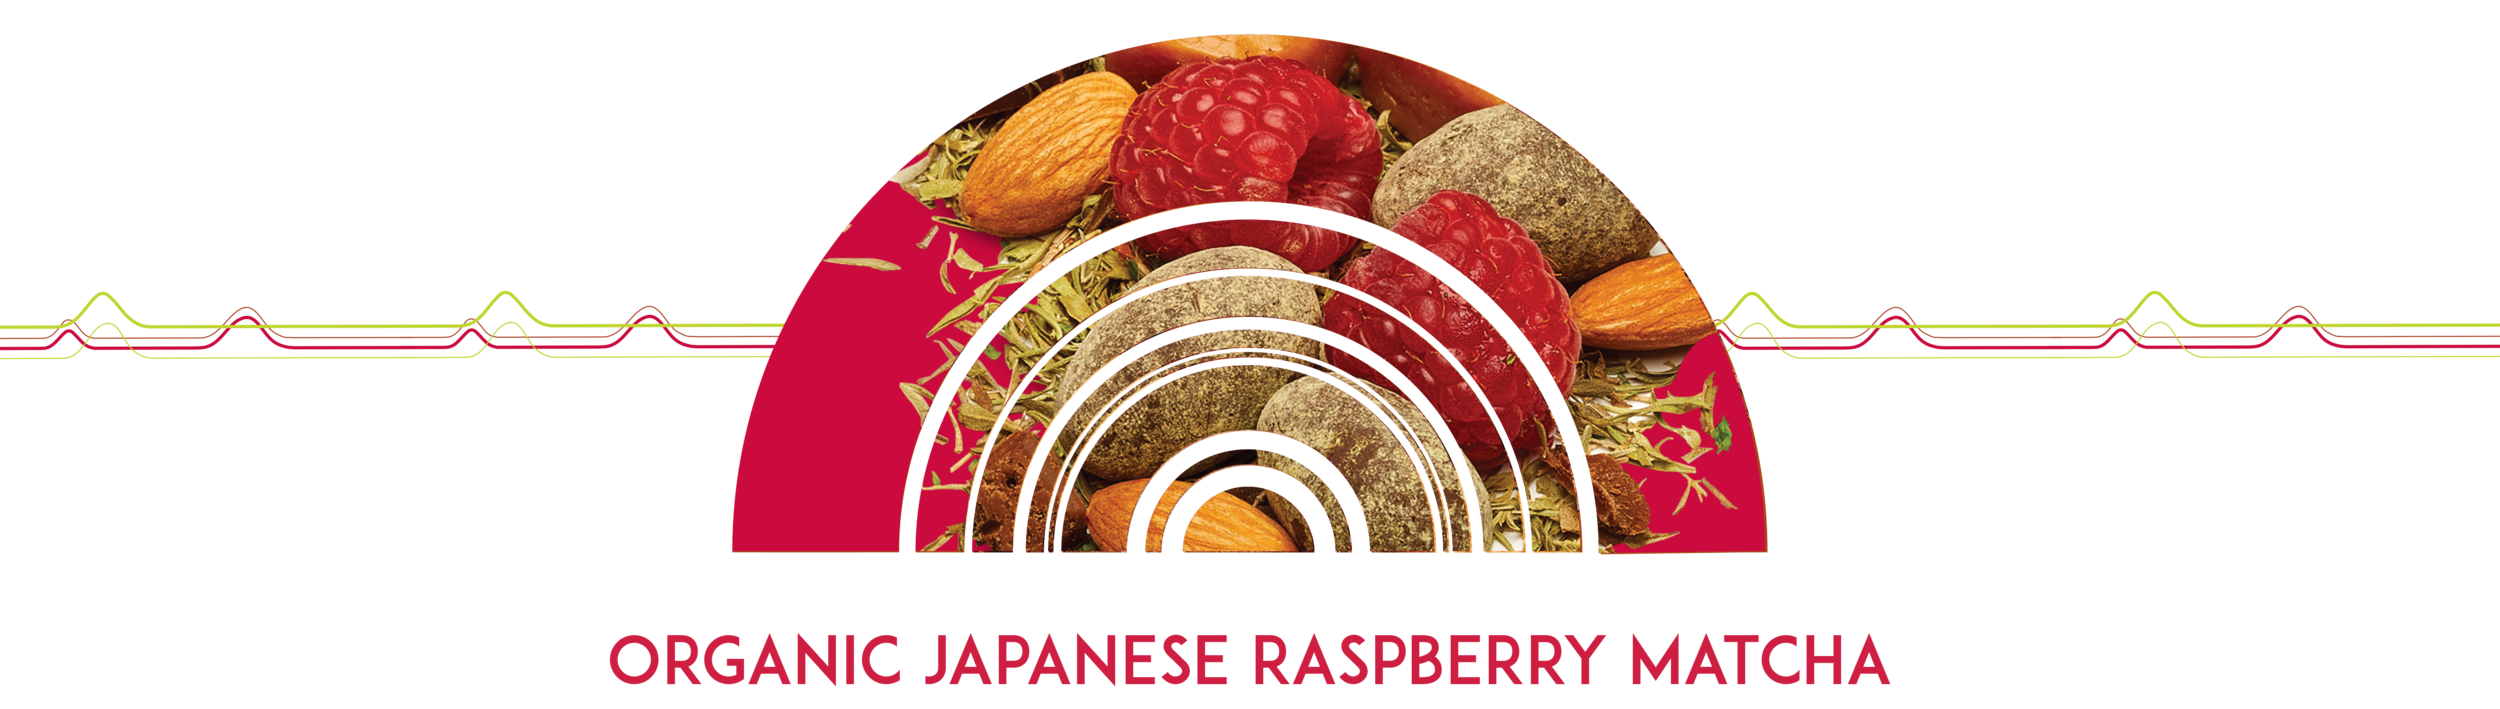 raspberry-banner.png